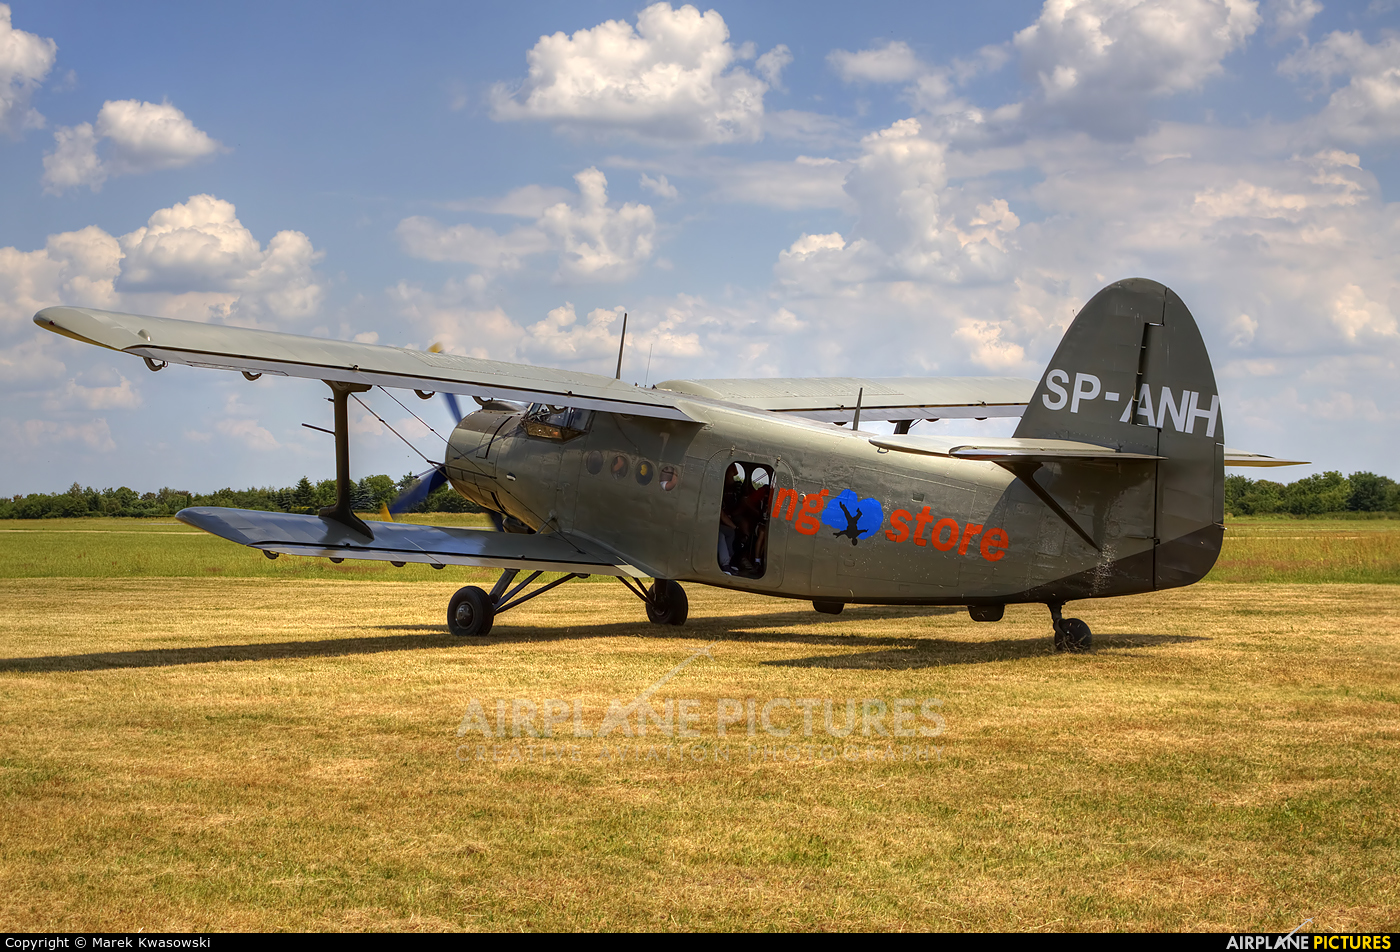 Private SP-ANH aircraft at Piotrków Trybunalski